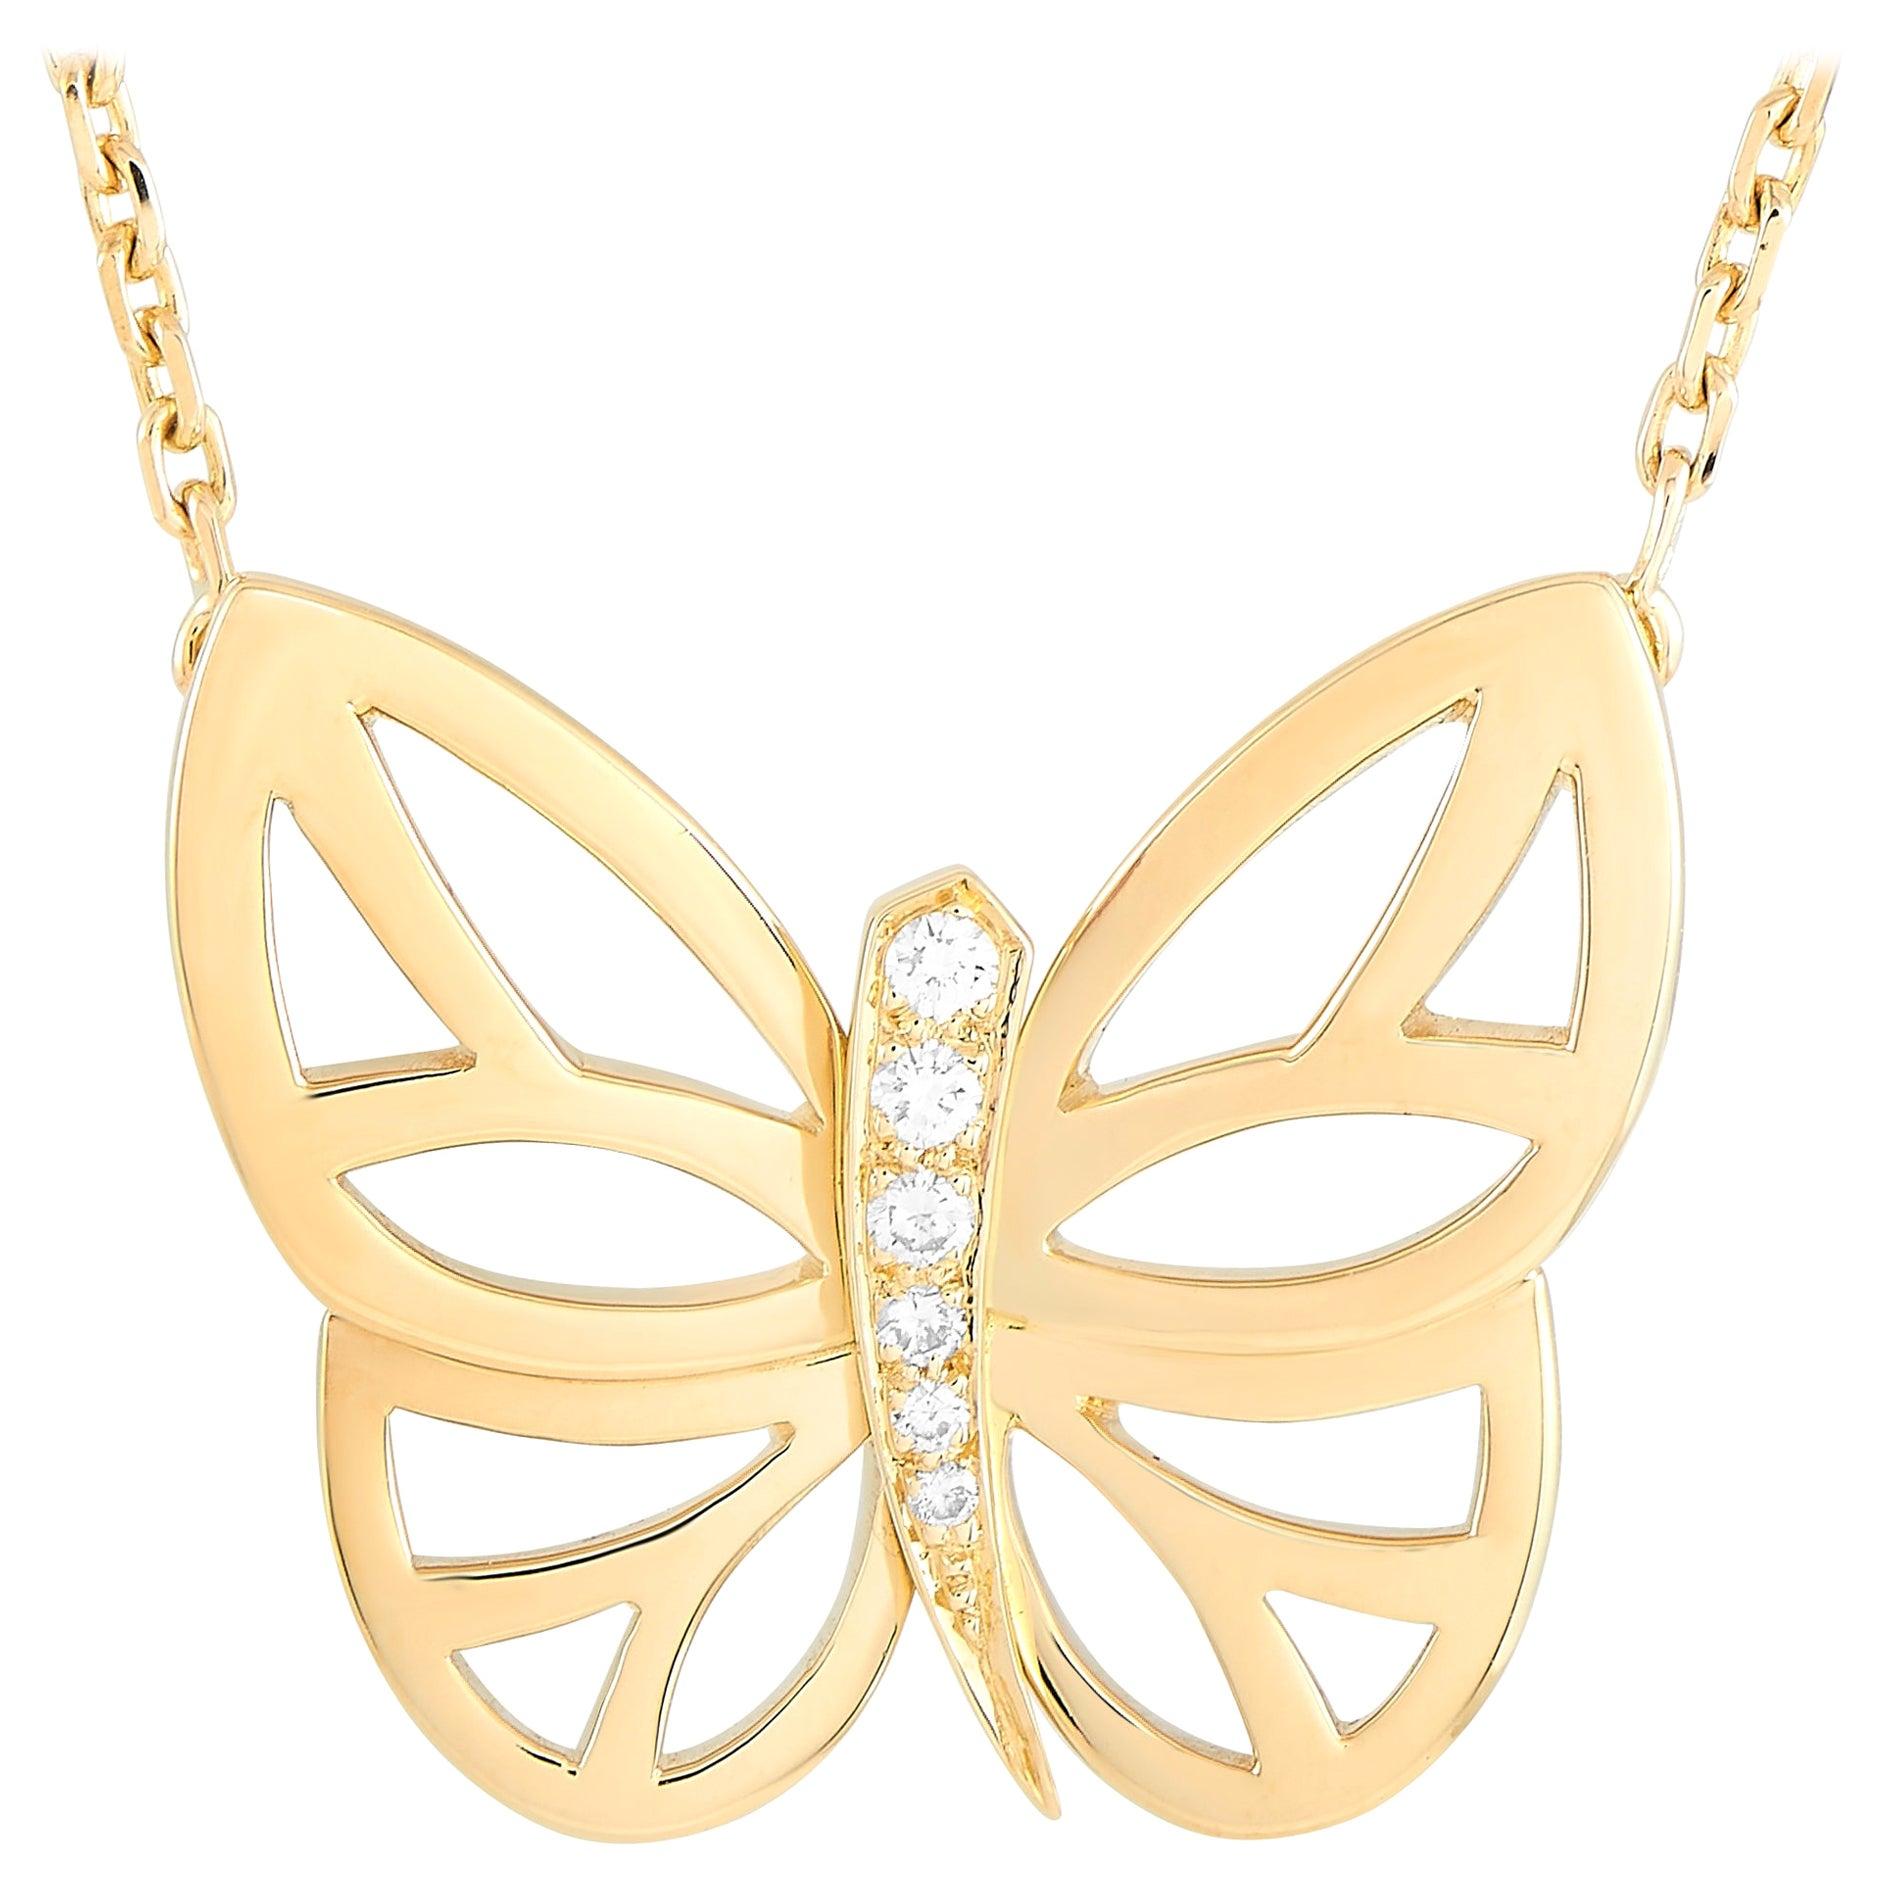 Van Cleef & Arpels 18 Karat Yellow Gold Diamond Butterfly Pendant Necklace